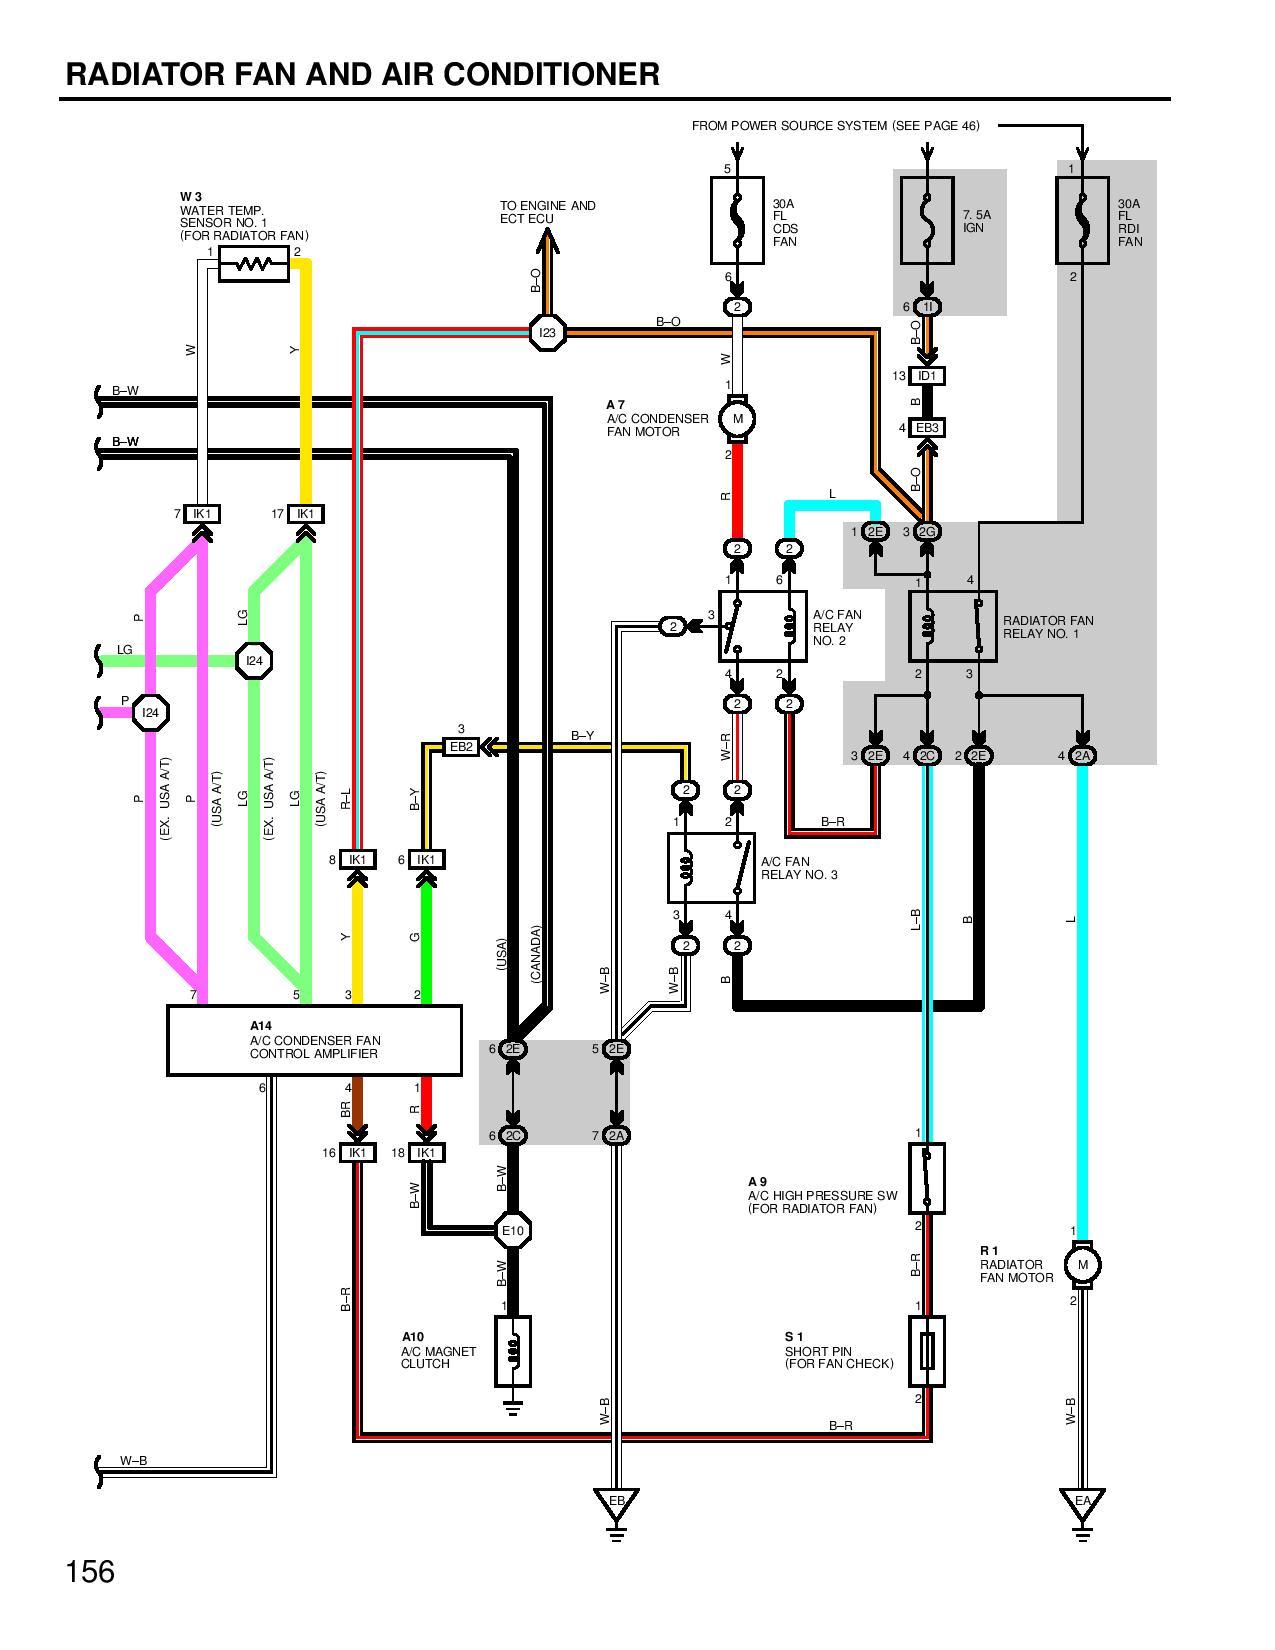 Panasonic Cq Rx100u Wiring Diagram C1101u Daihatsu Hijet S65 33 C1303u